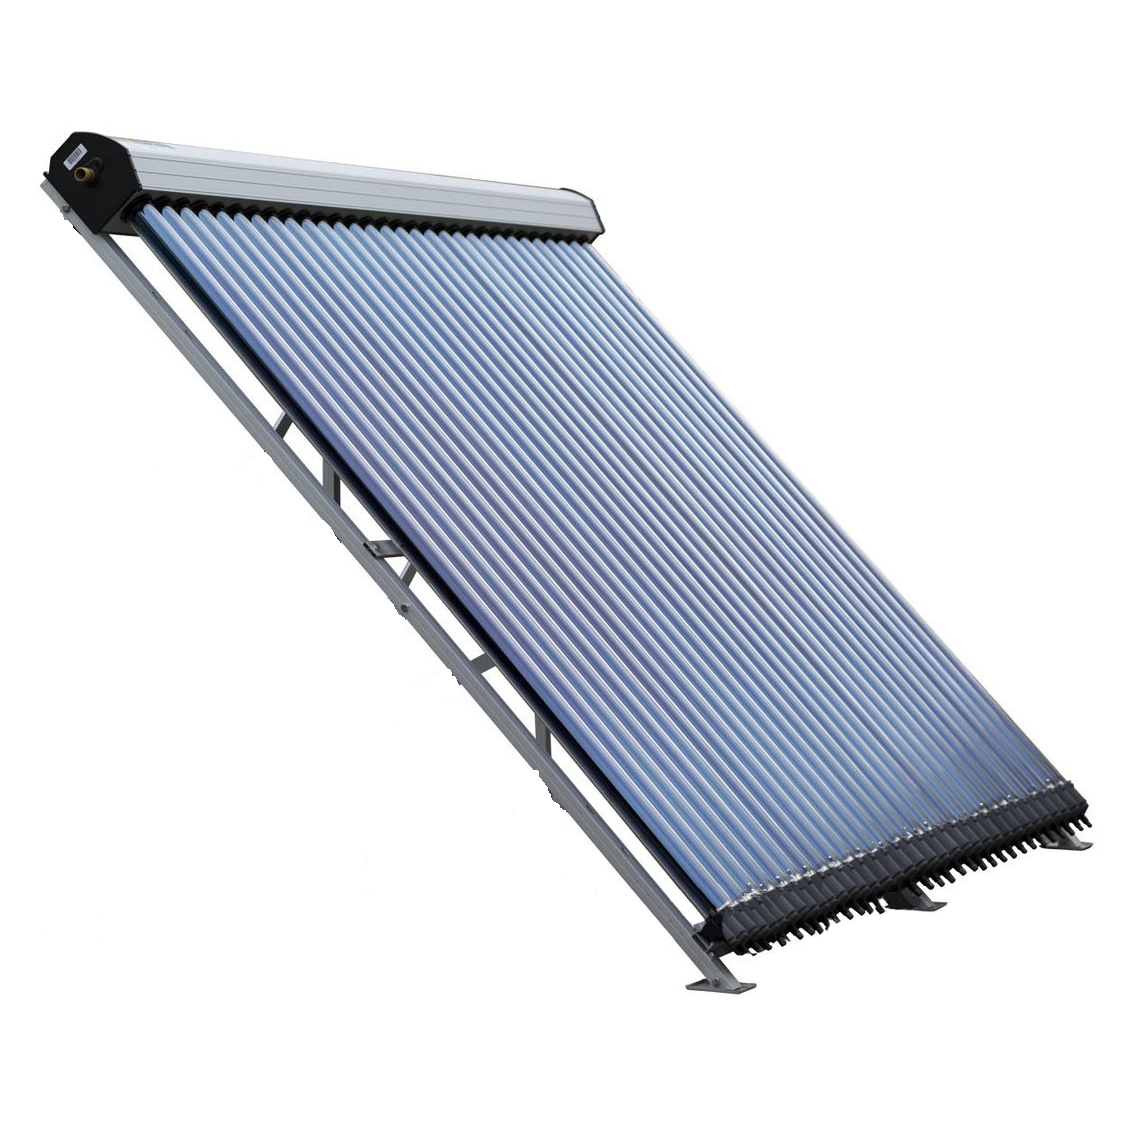 Солнечный коллектор sc-lh2-30 без задних опор